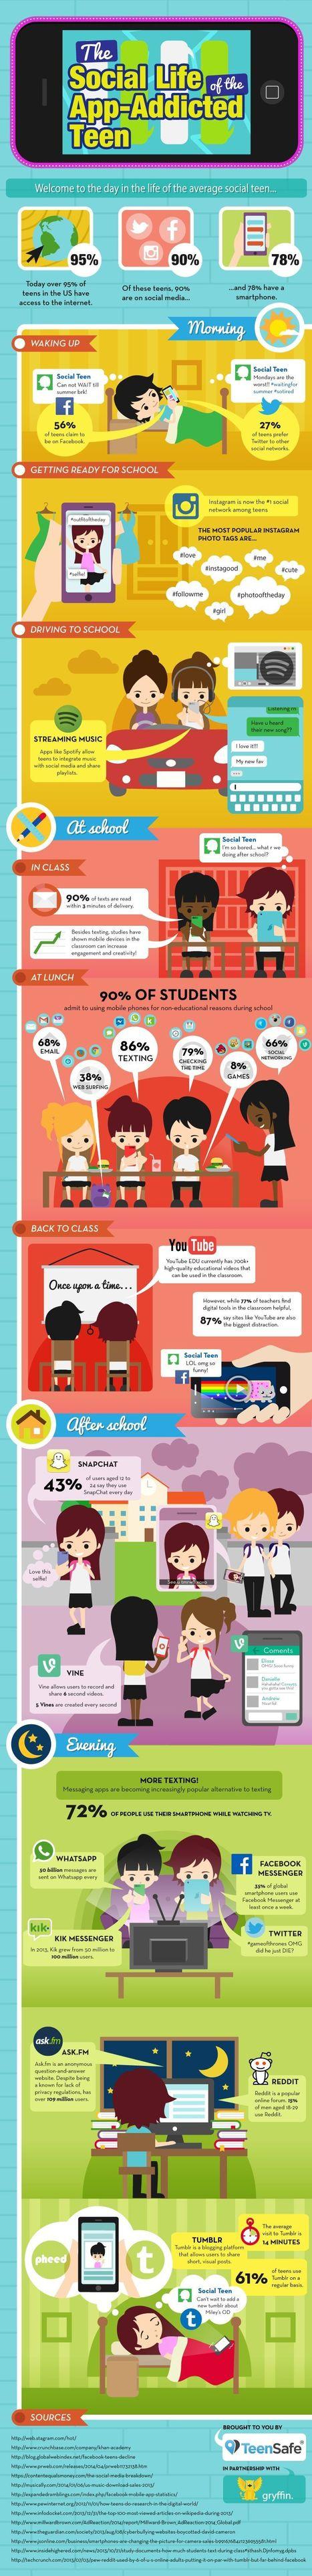 The Social Life of the App-Addicted Teen [Infographic] | La révolution numérique - Digital Revolution | Scoop.it